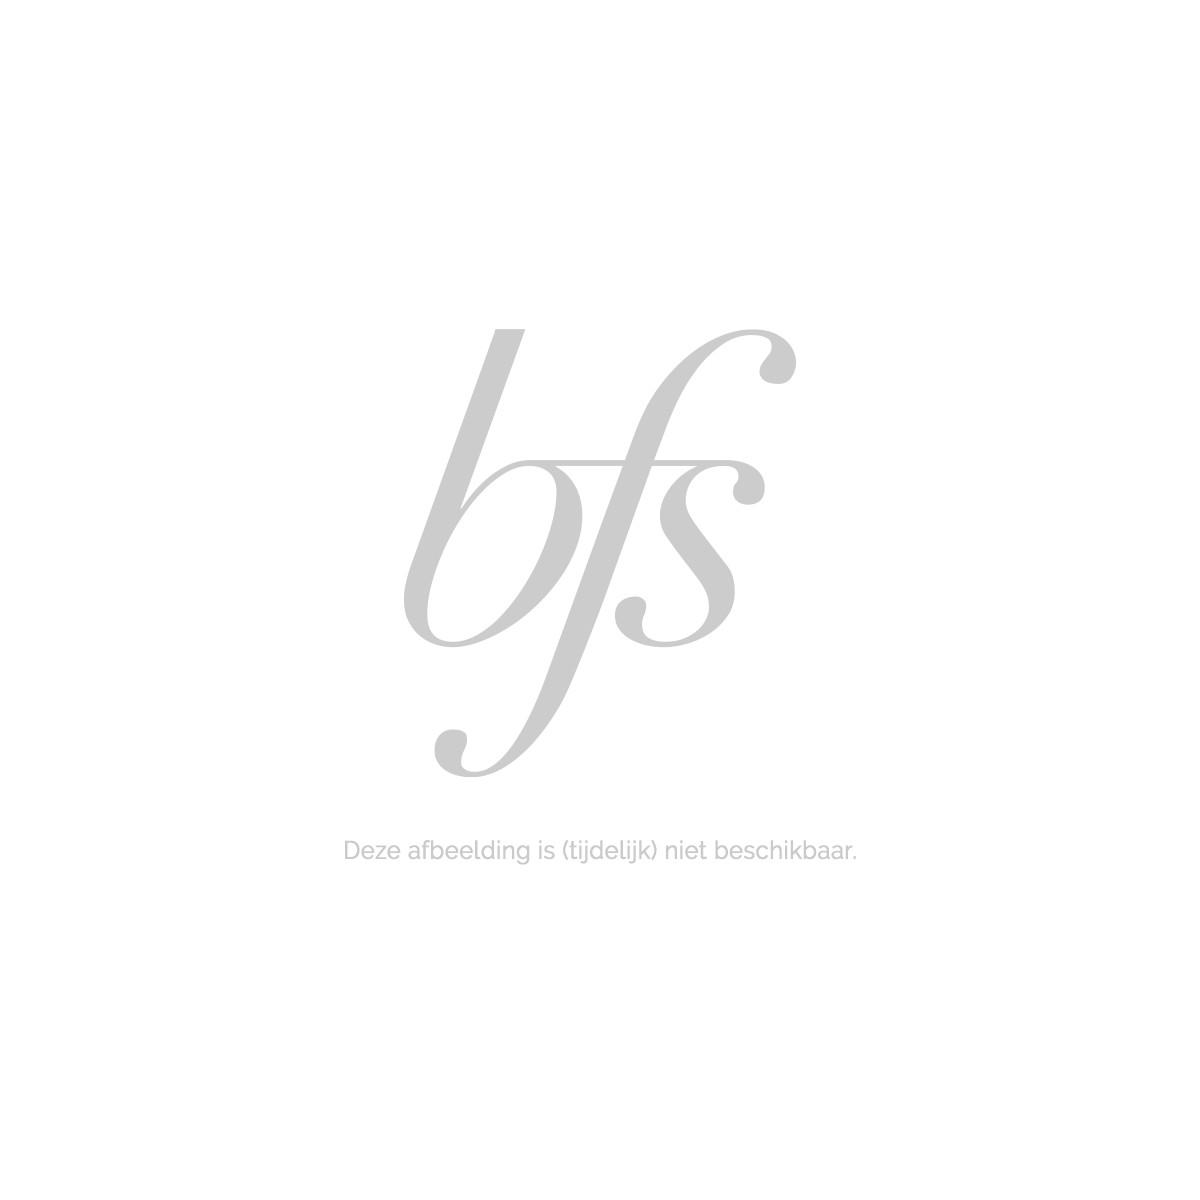 Biomaris Skin Cream 50 Ml Without Perfume